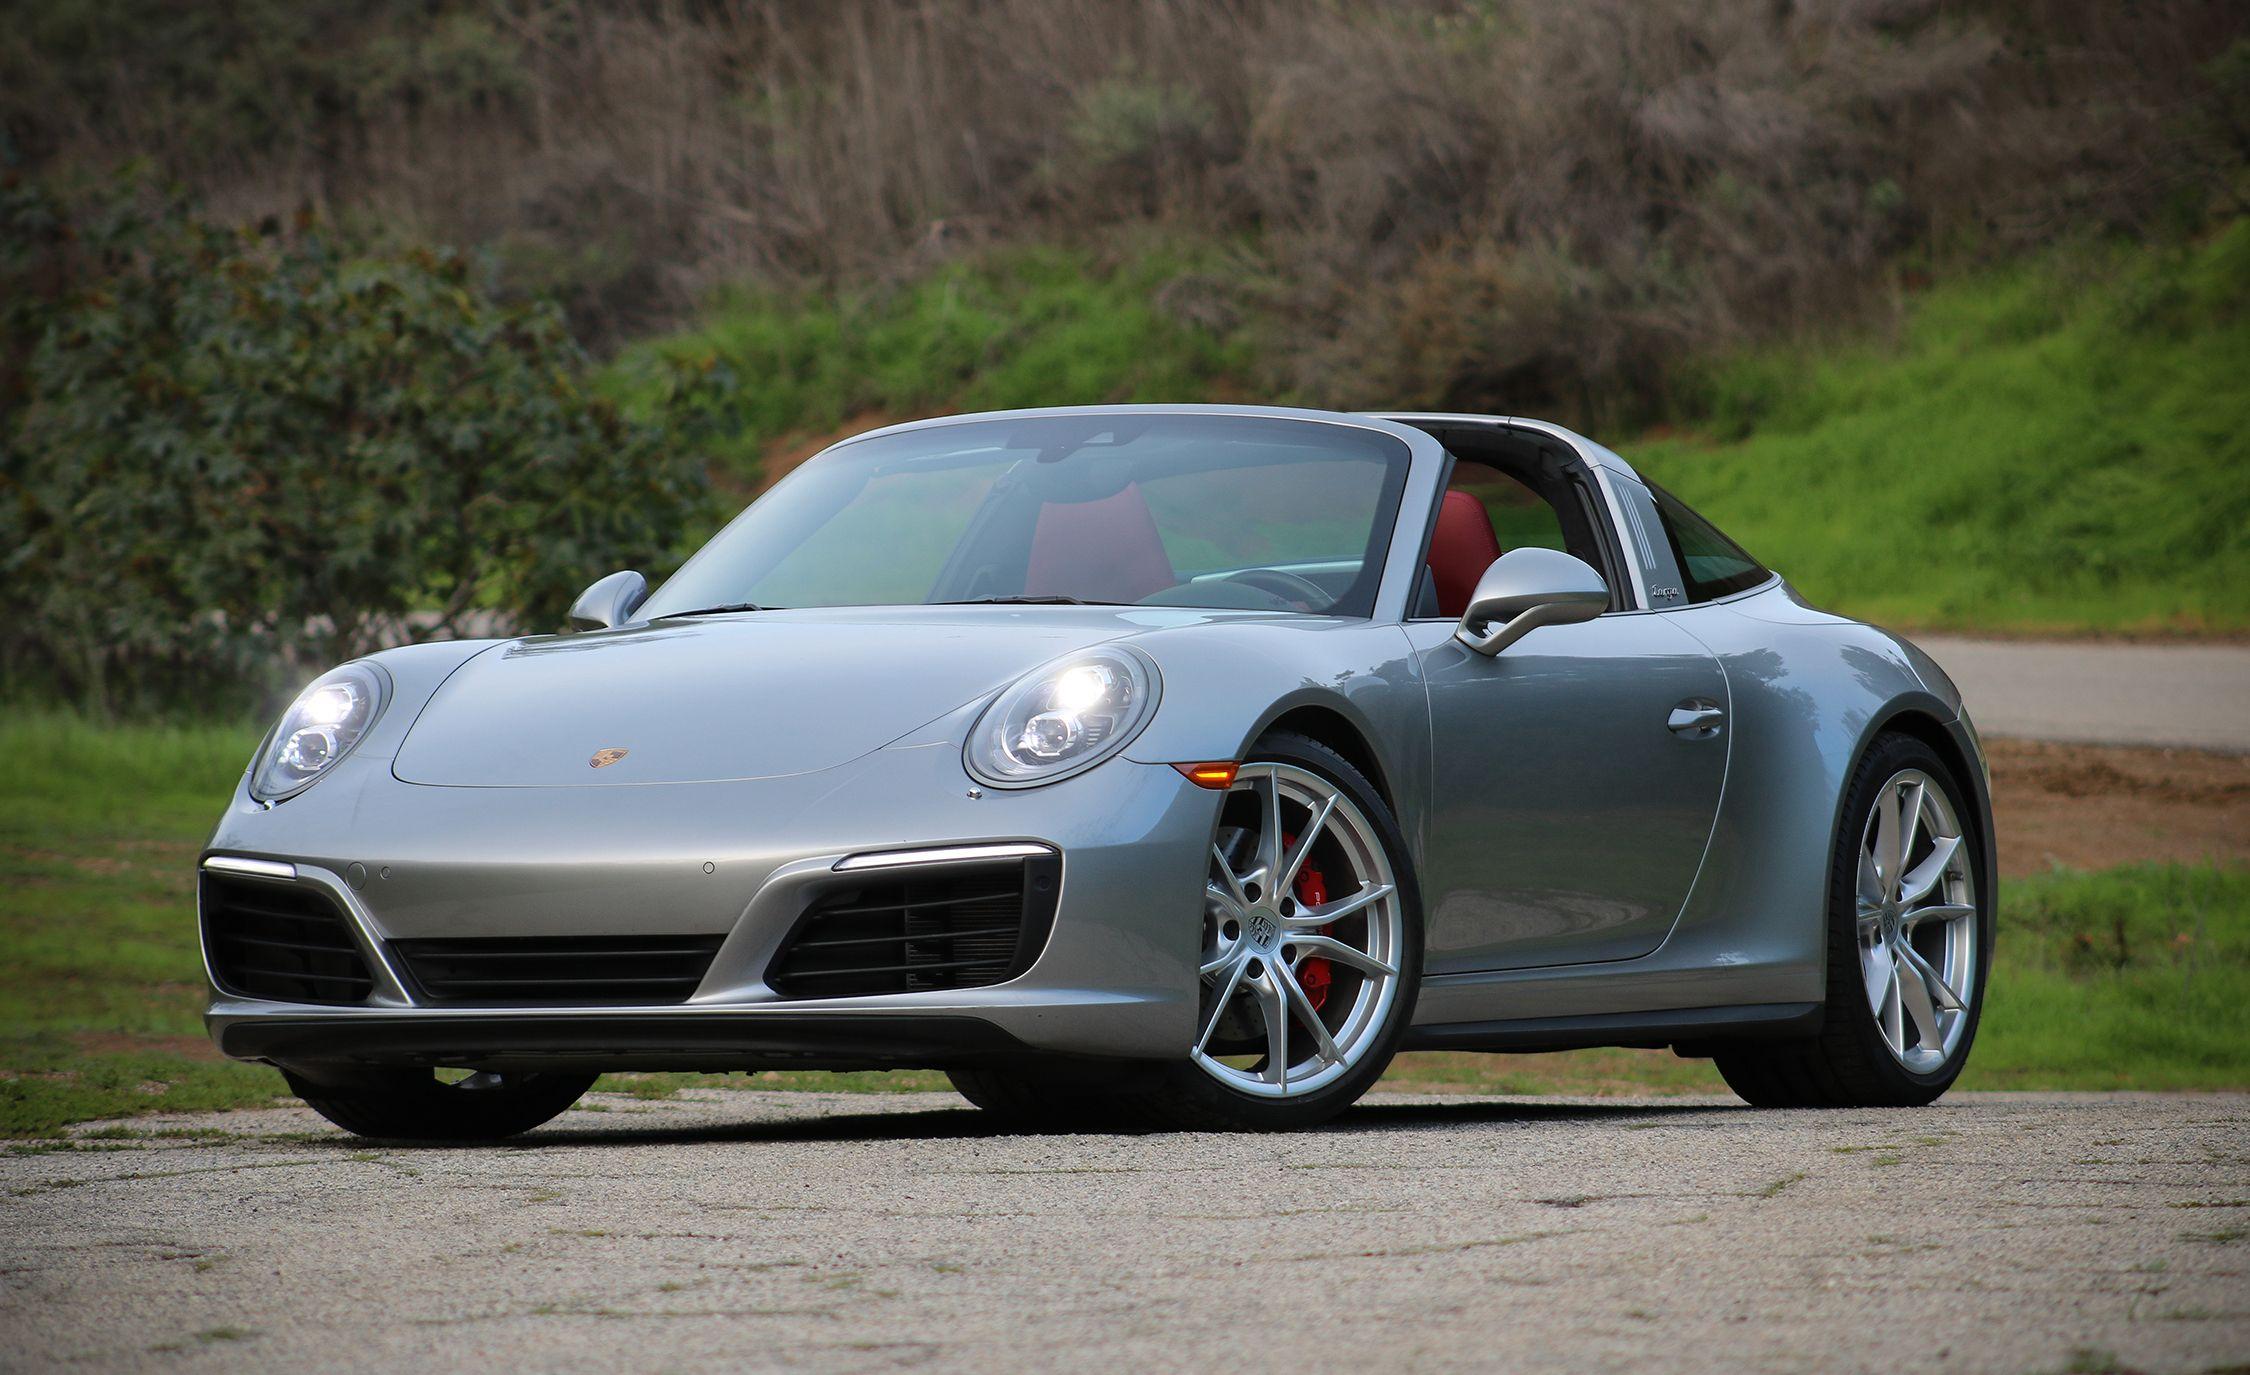 2017 Porsche 911 Carrera 4s Targa Automatic Test Review